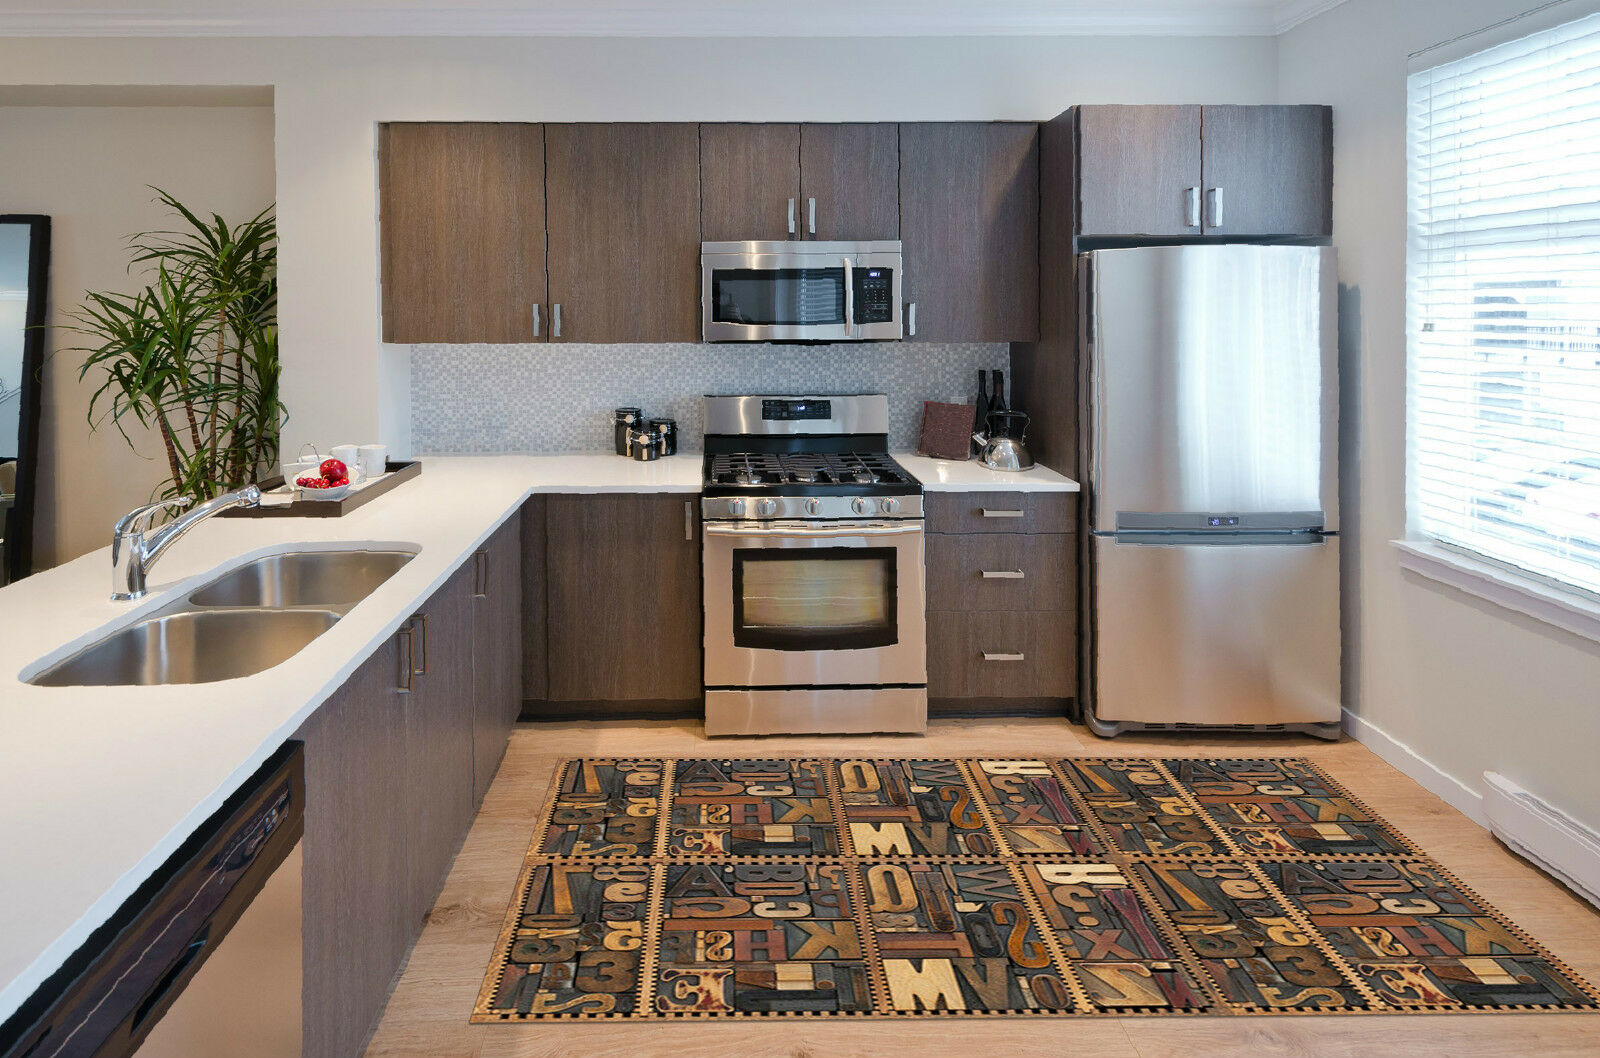 Stampe Da Cucina : 3d alfabeto numeri tappeto da cucina muro pavimento muro cucina